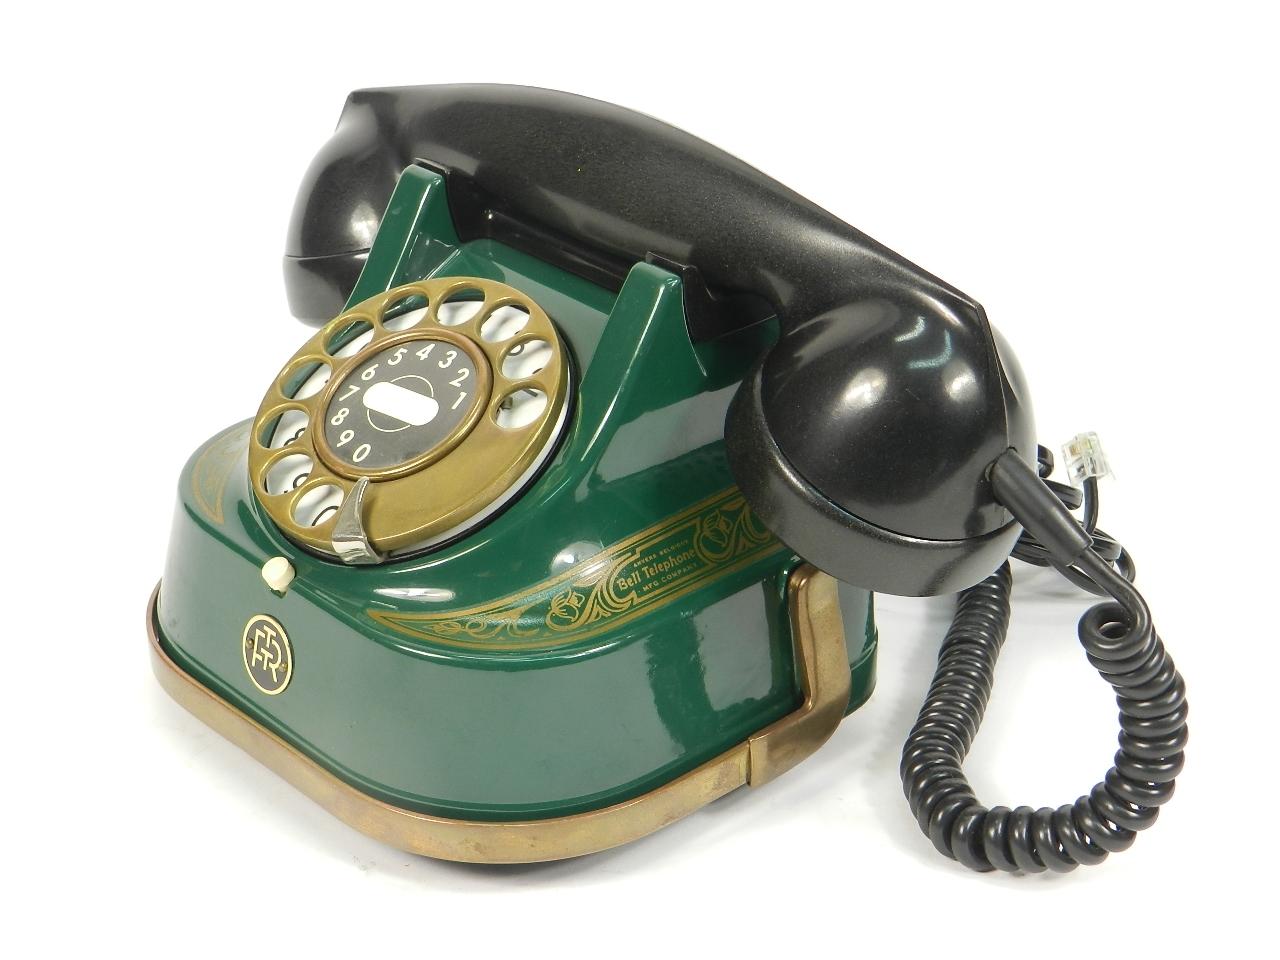 Imagen BELL TELEPHONE Cº  AÑO 1940, BELGICA 41400